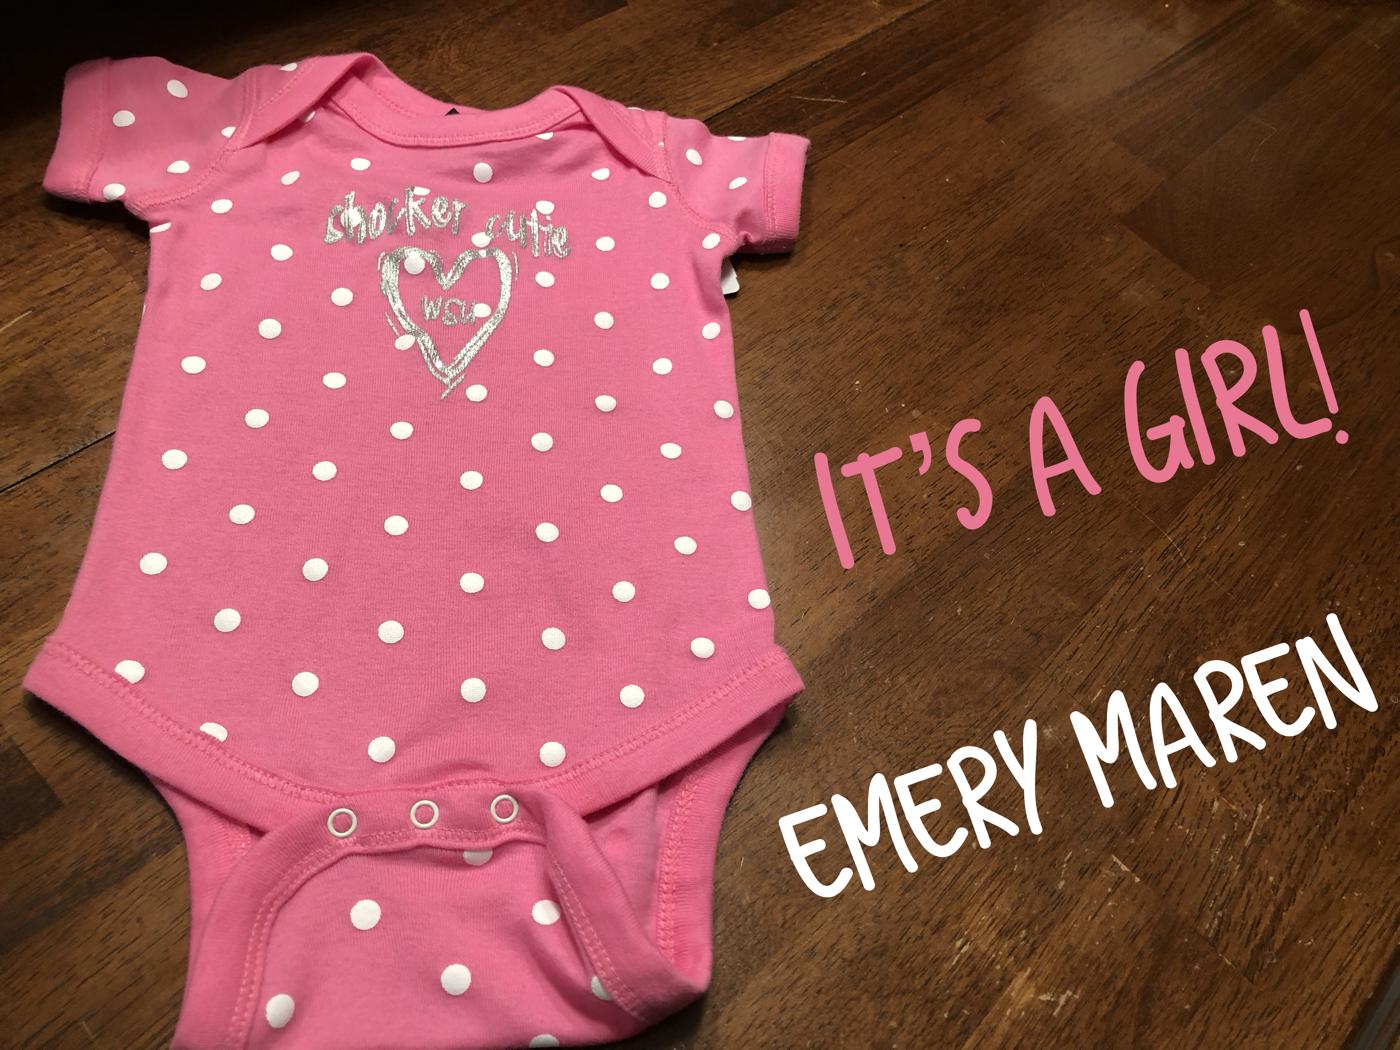 It's a girl.. Emery Maren….